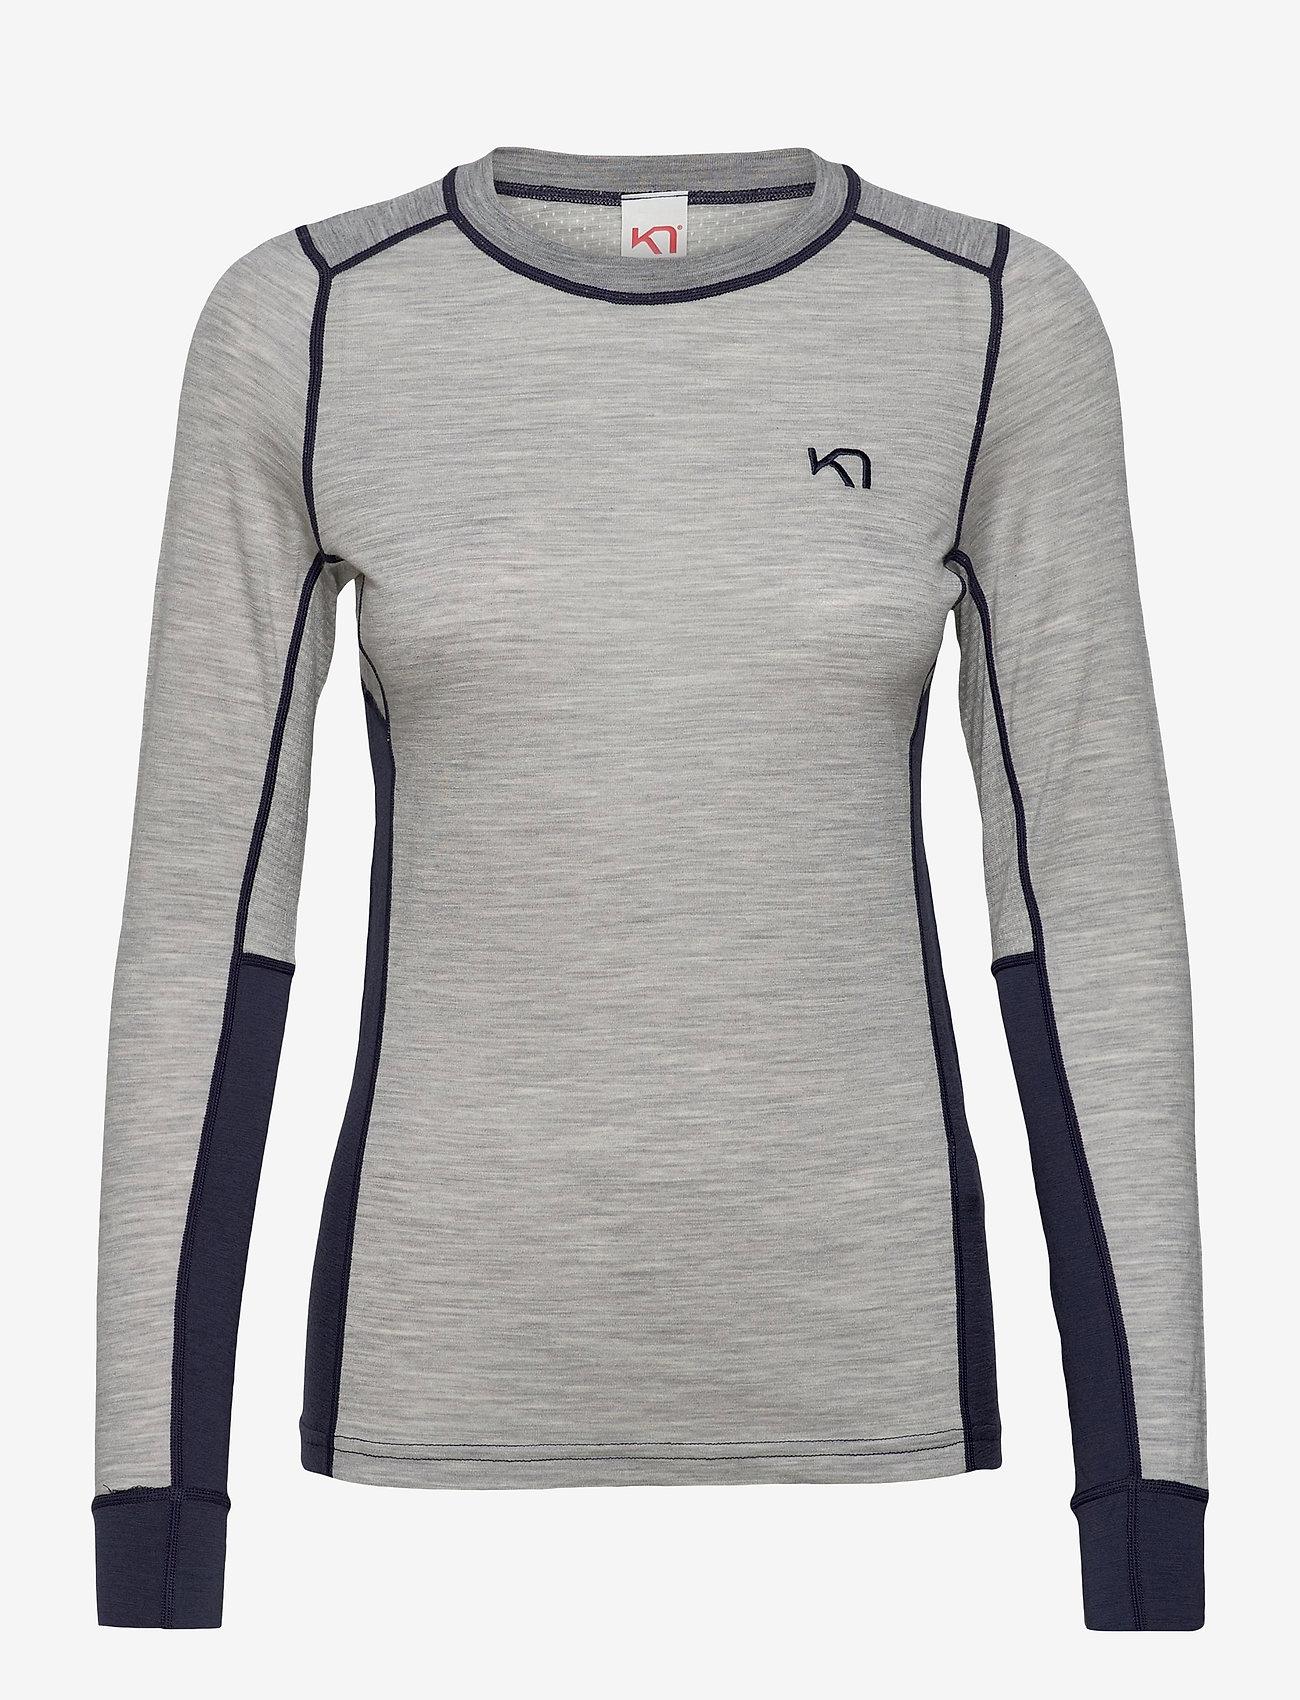 Kari Traa - LAM LS - thermo ondershirts - greym - 1